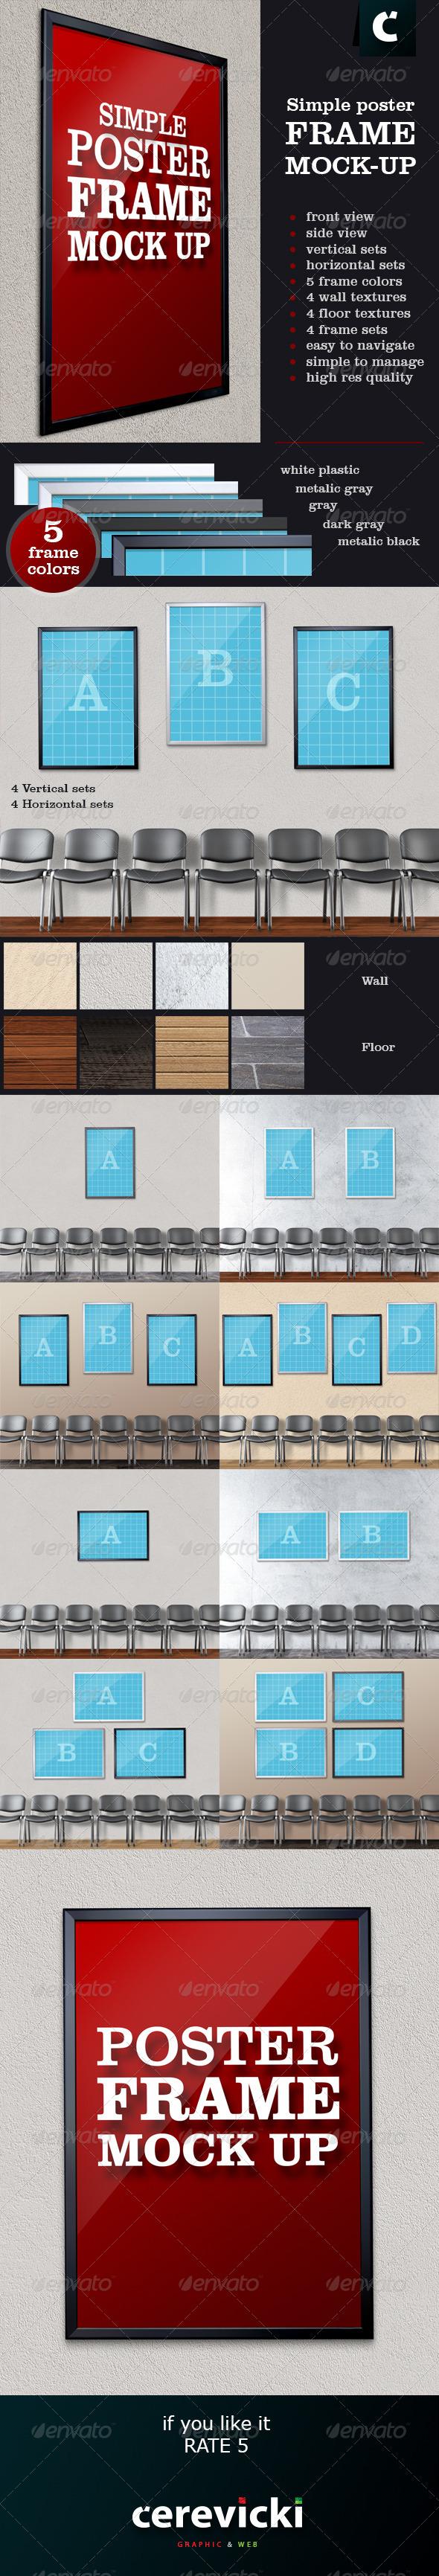 GraphicRiver Simple Poster Frame Mock-Up 7059662